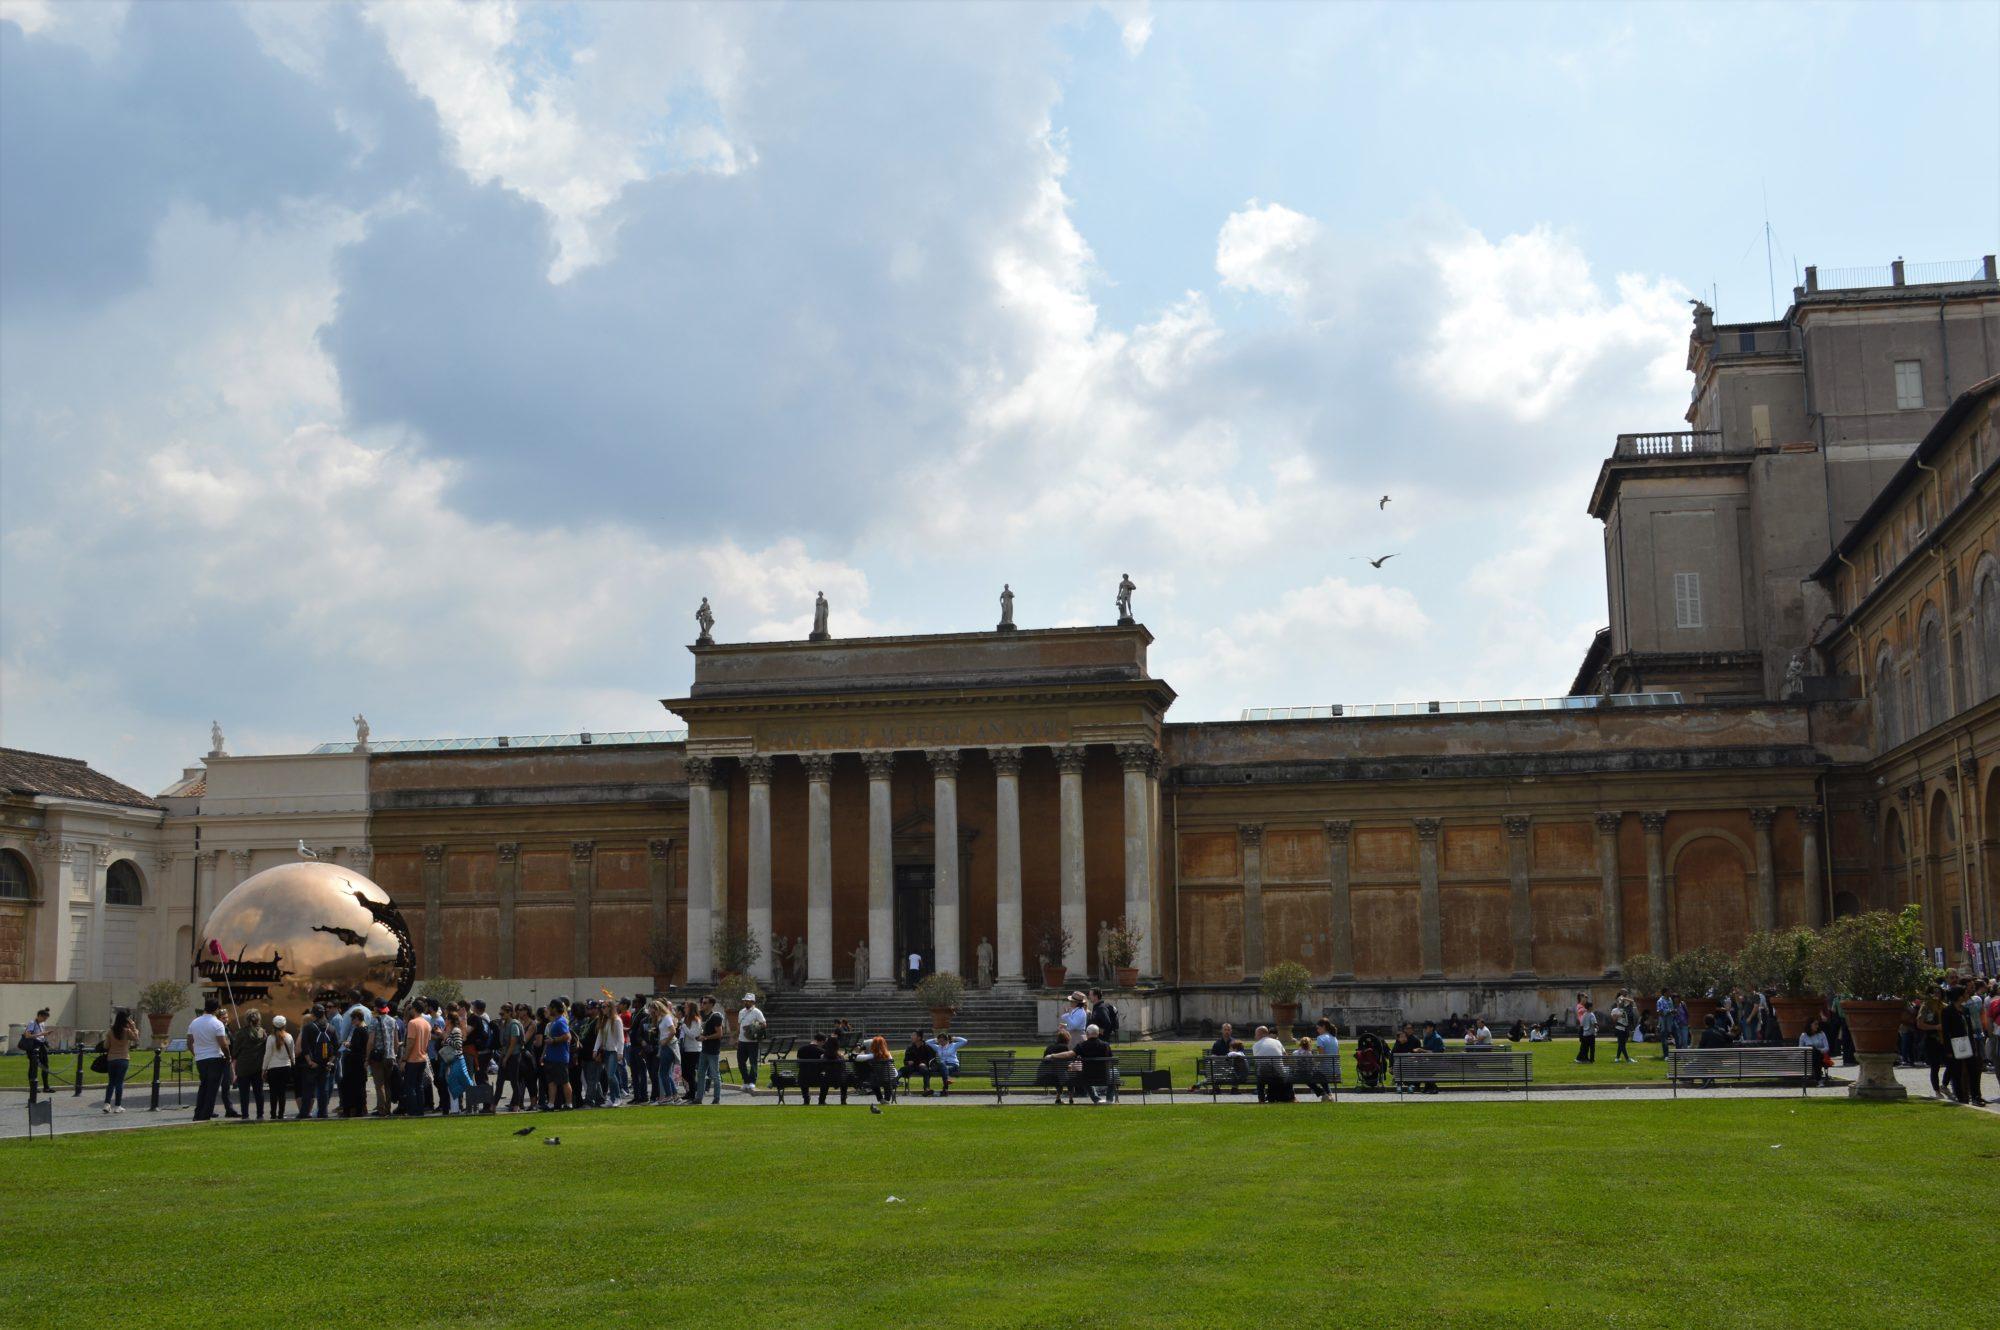 vatican-museums-pigna